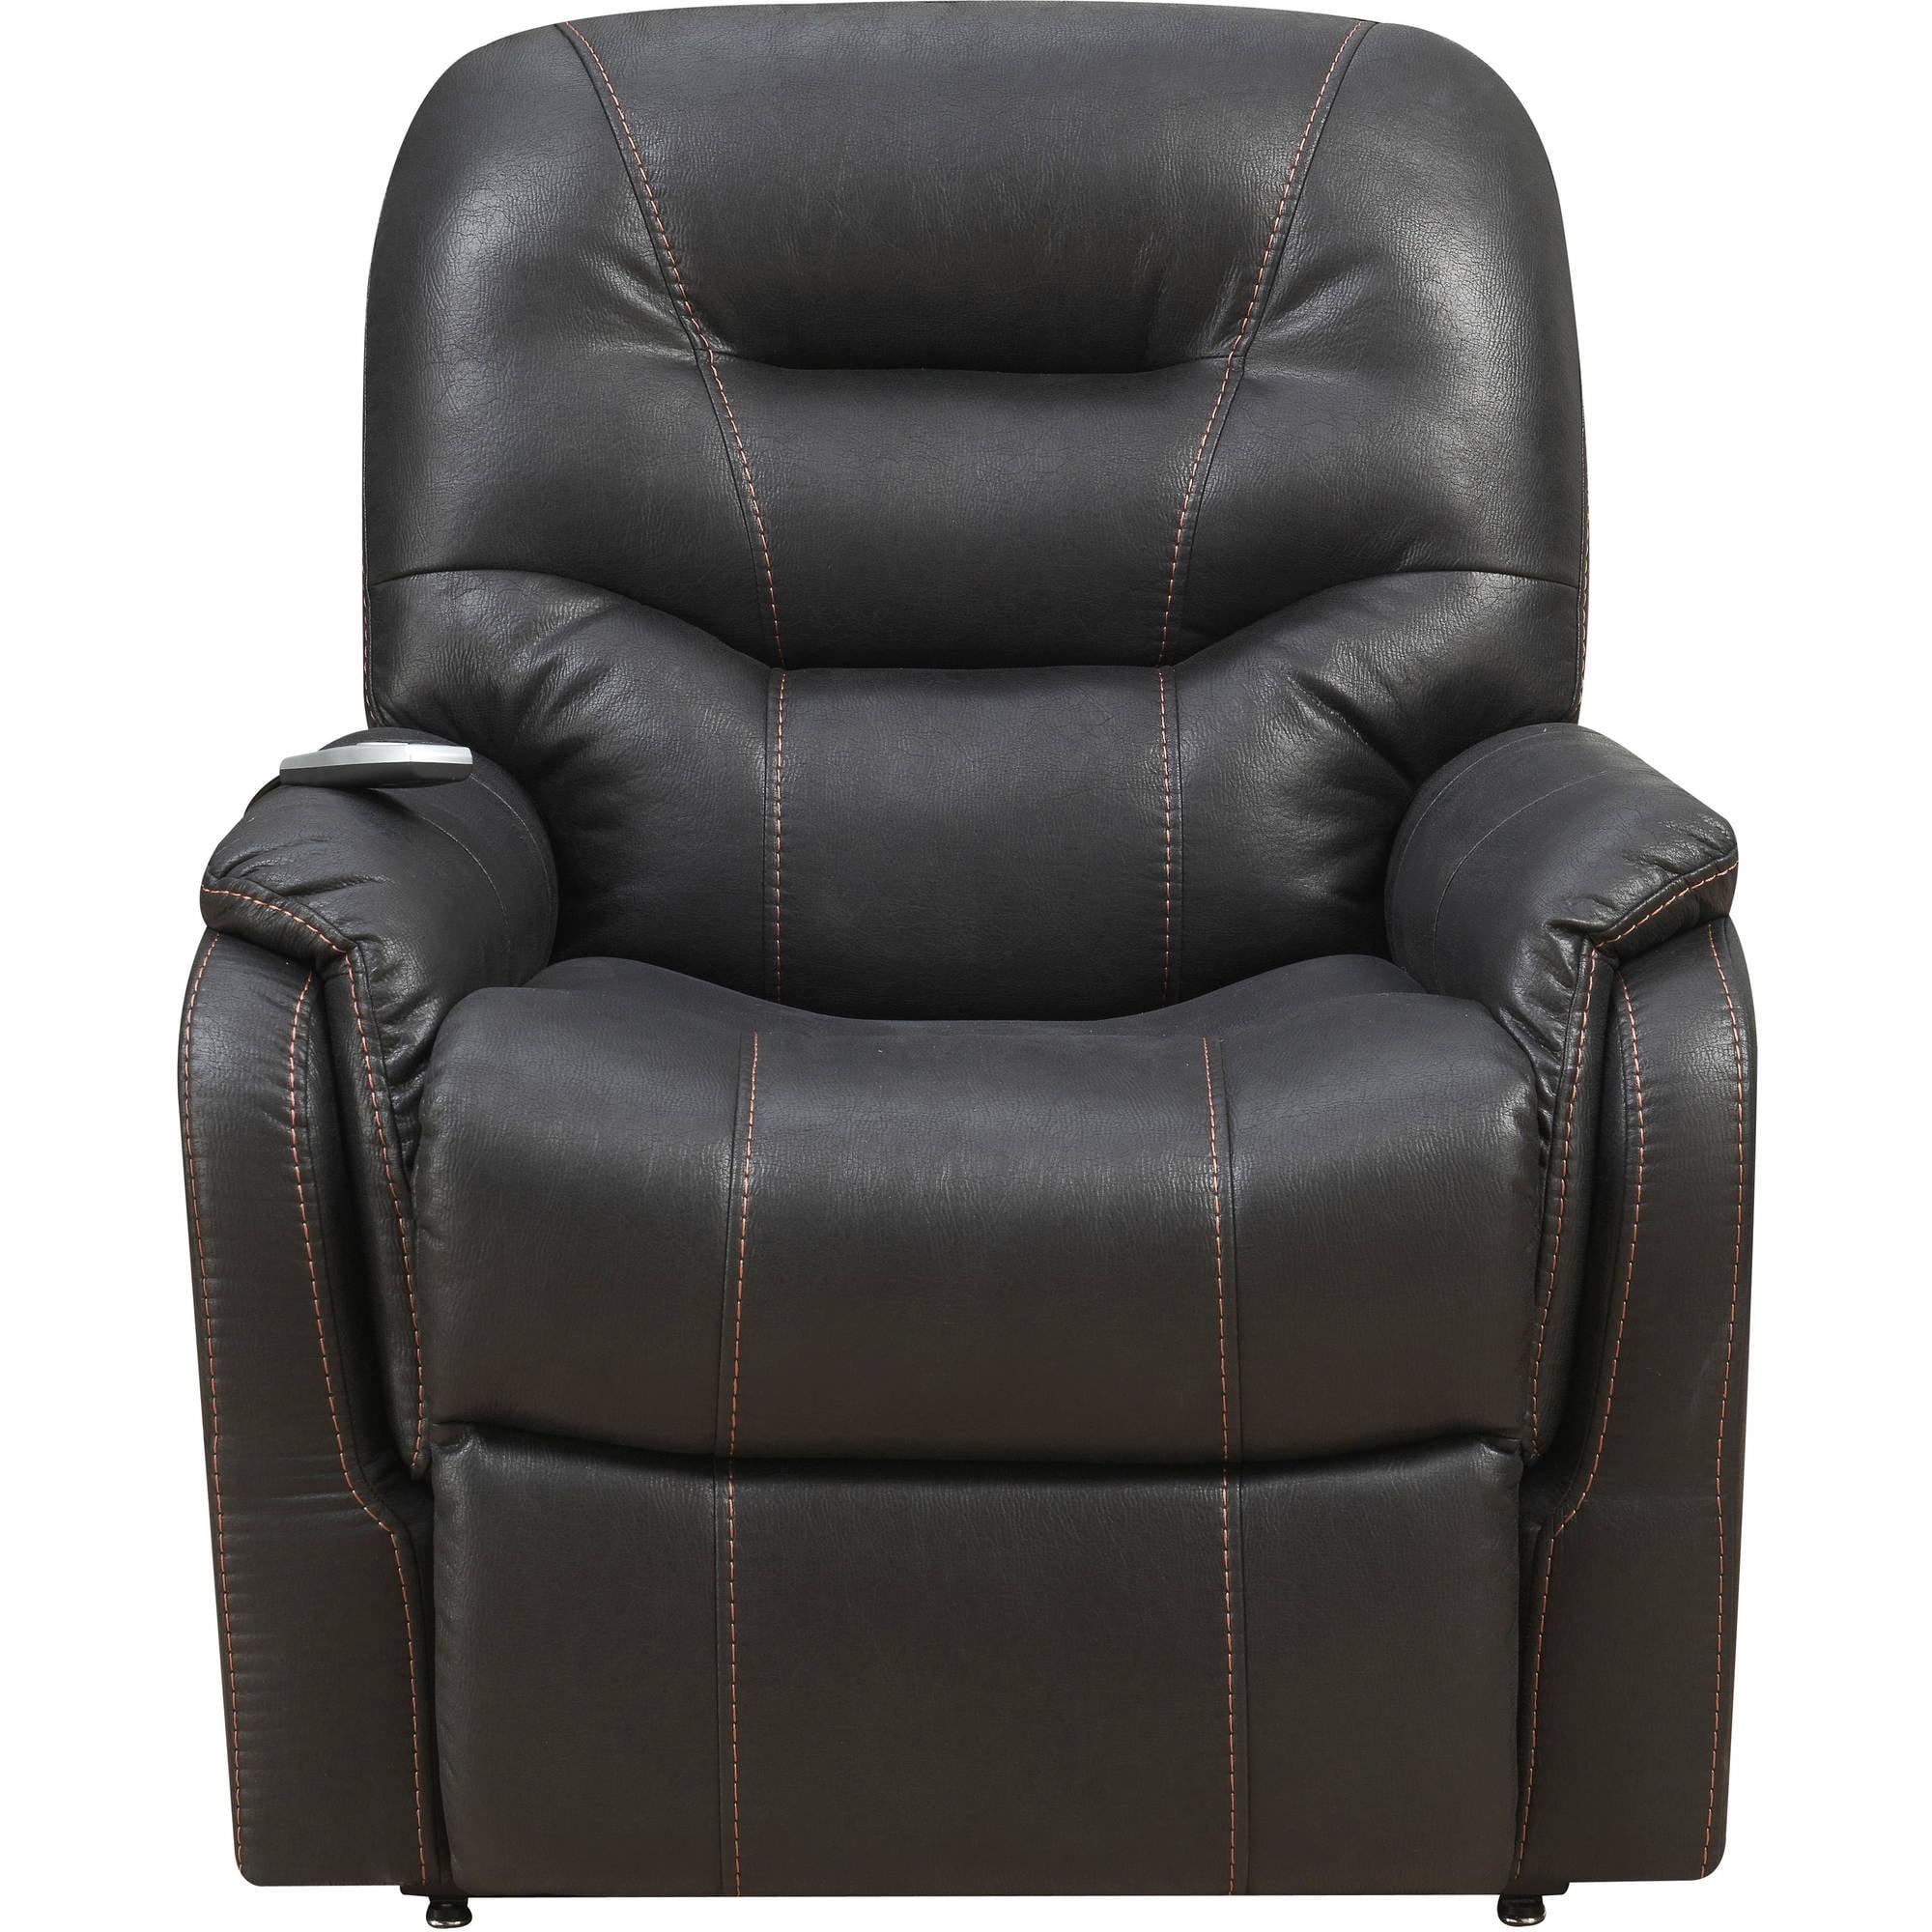 Heat & Massaging Lift Chair in Badlands Eclipse